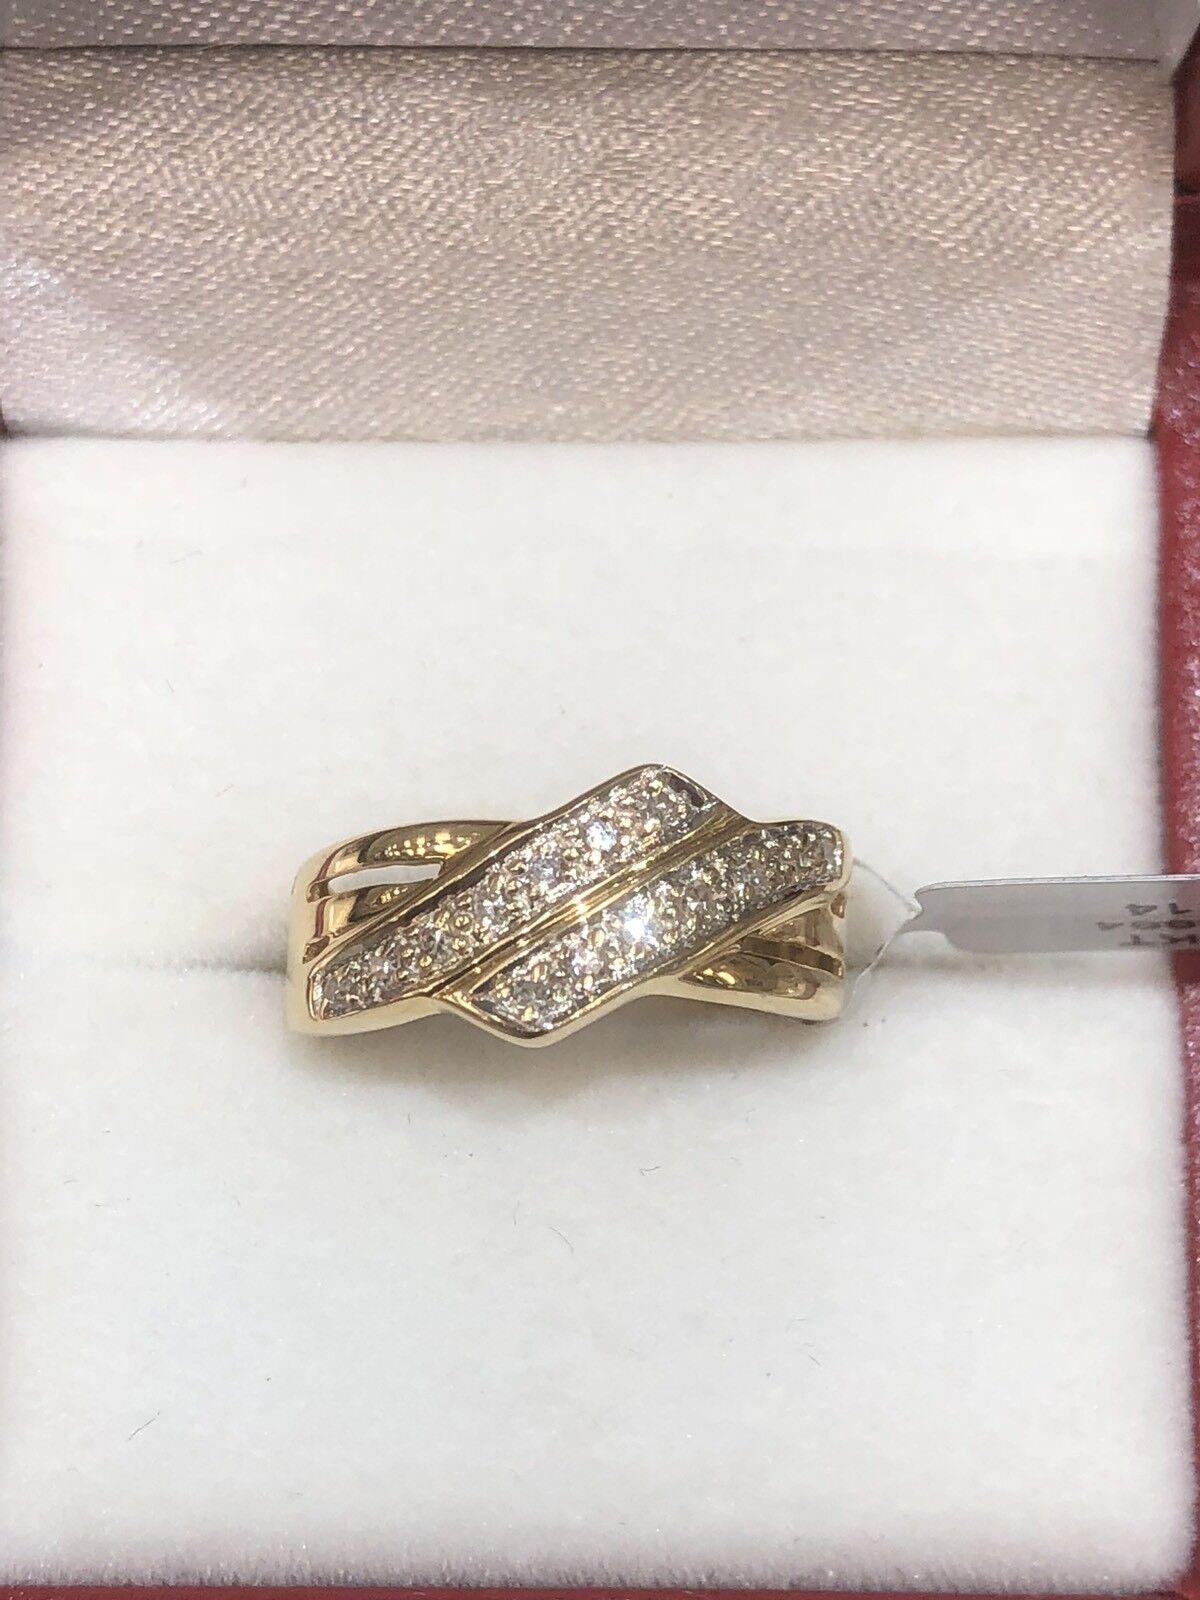 18k gold diamond ring. tdwt 0.14ct